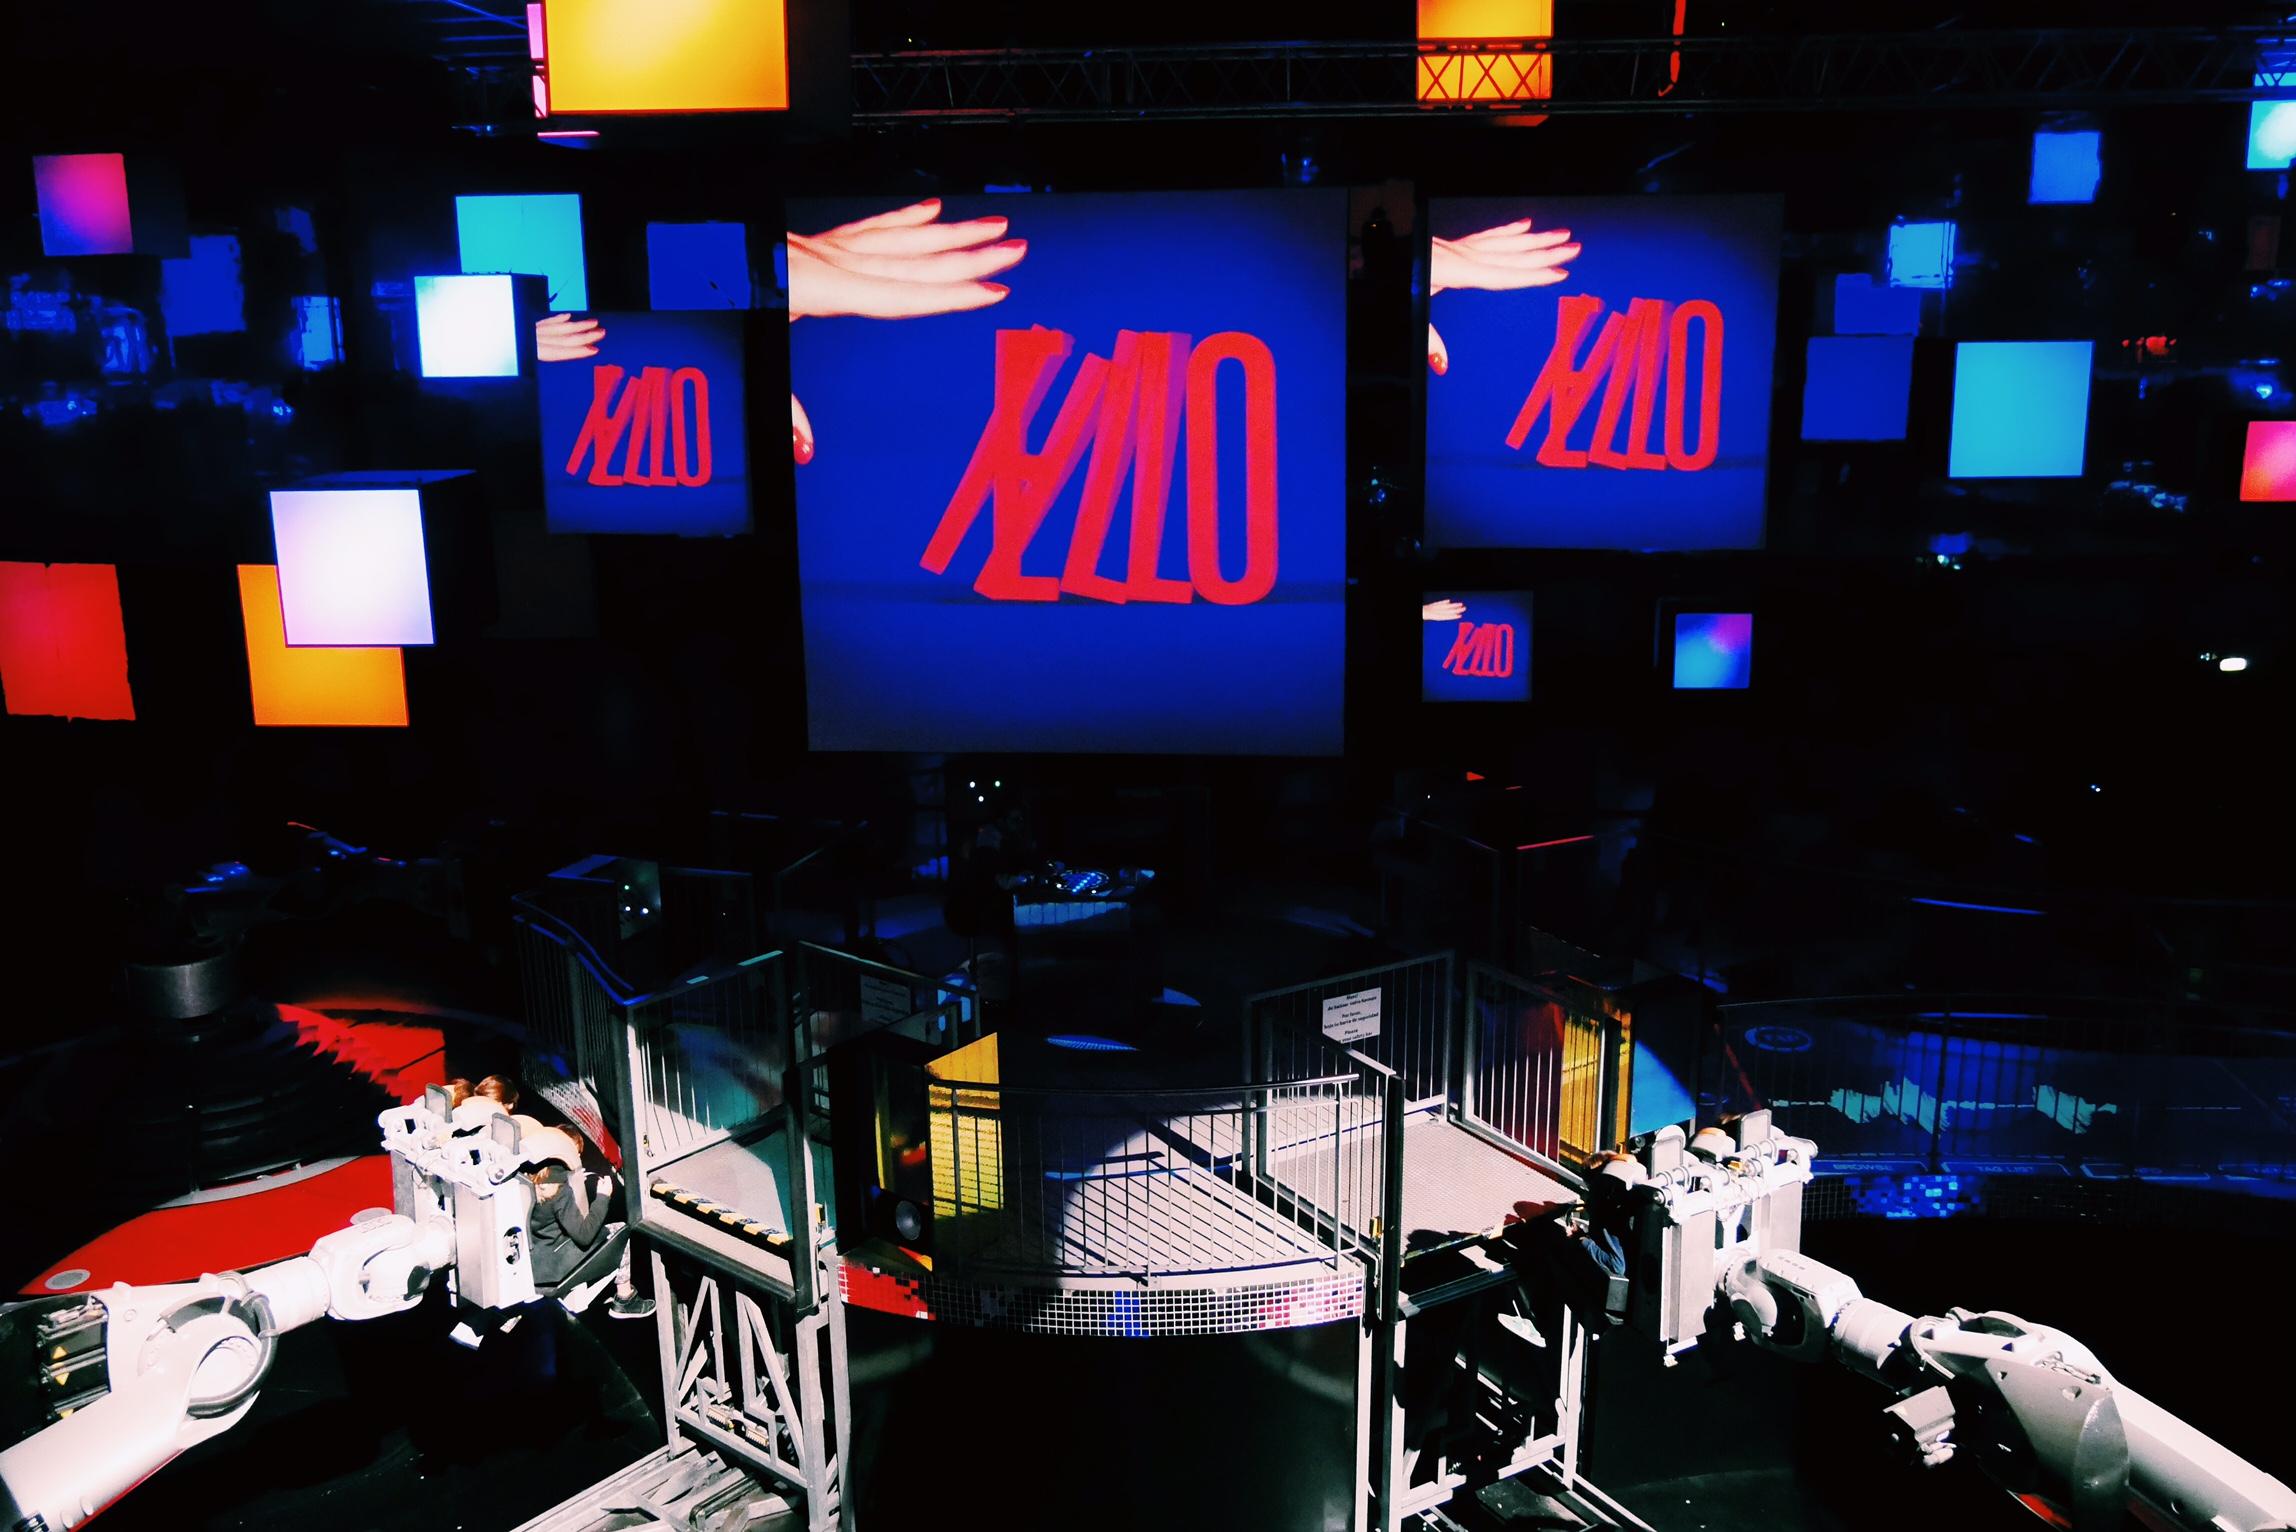 Danse-avec-les-robots-Martin-Solveig-Futuroscope-attraction-musicale-spectacle-photo-usofparis-blog